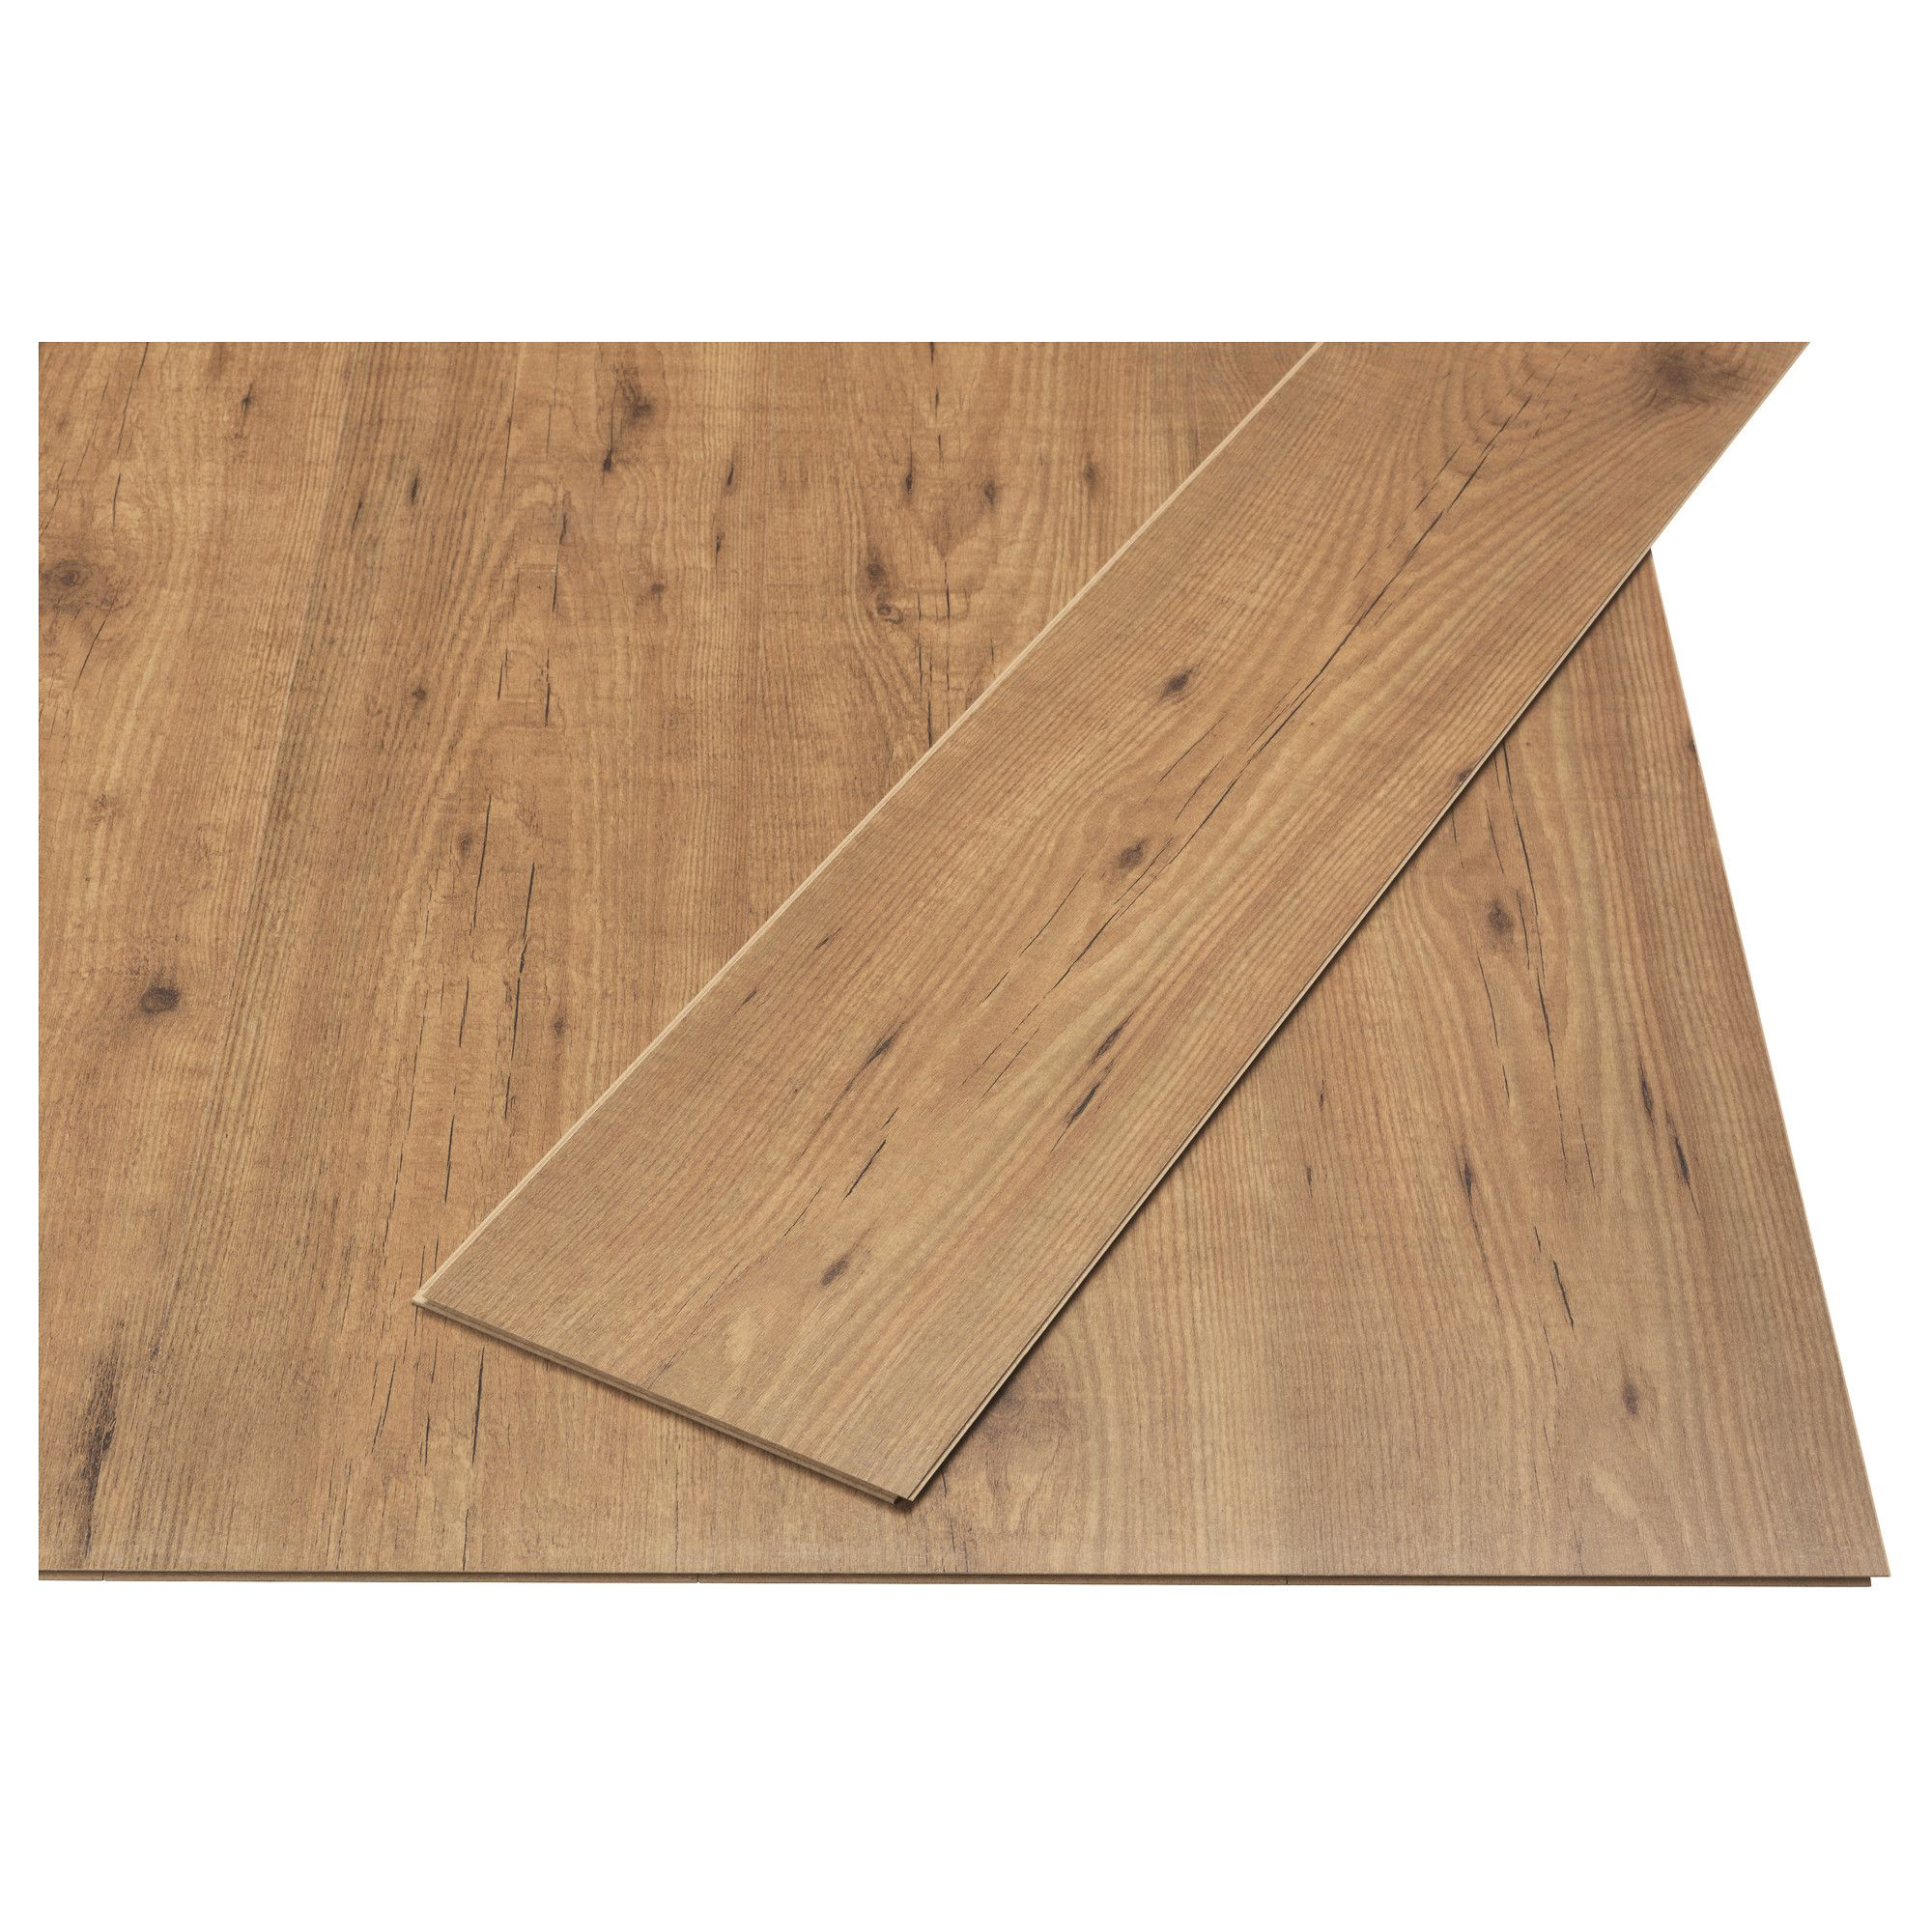 Tundra pavimento in laminato ikea office ikea for Ikea tundra